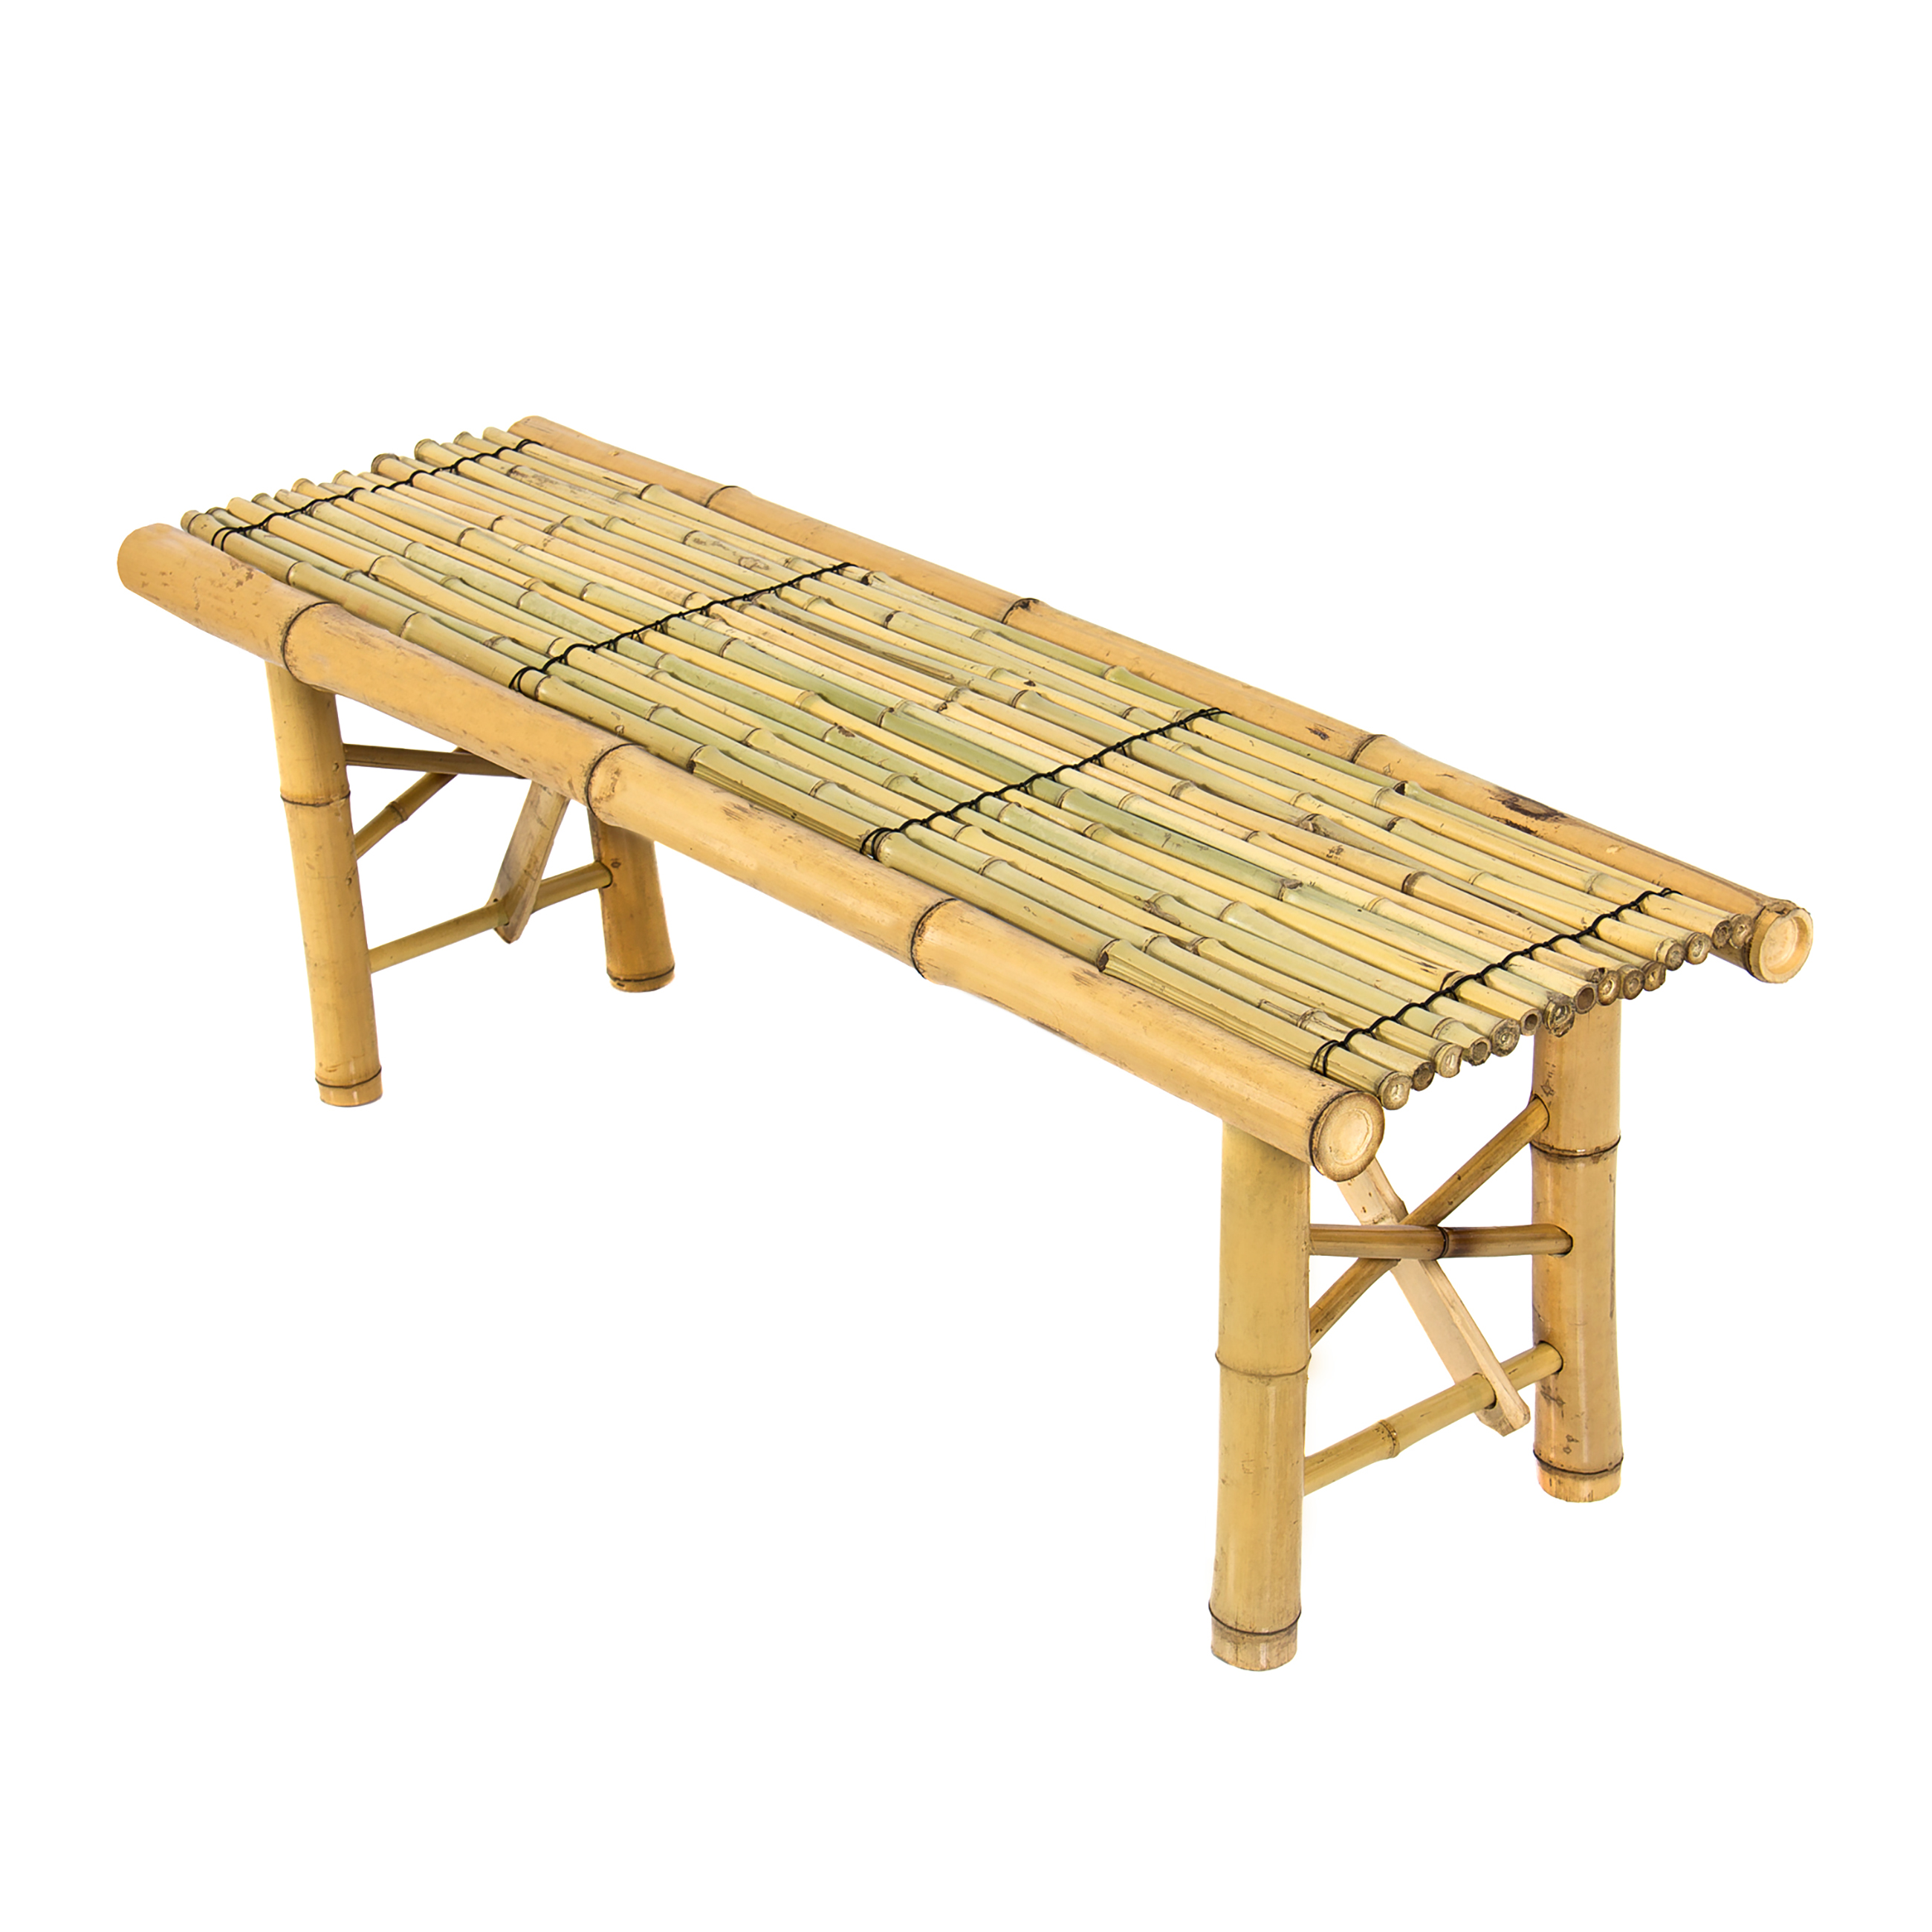 bamboo bench tiki tropical coffee table decorative bench patio  - bamboo bench tiki tropical coffee table decorative bench patio room baroutdoor  walmartcom